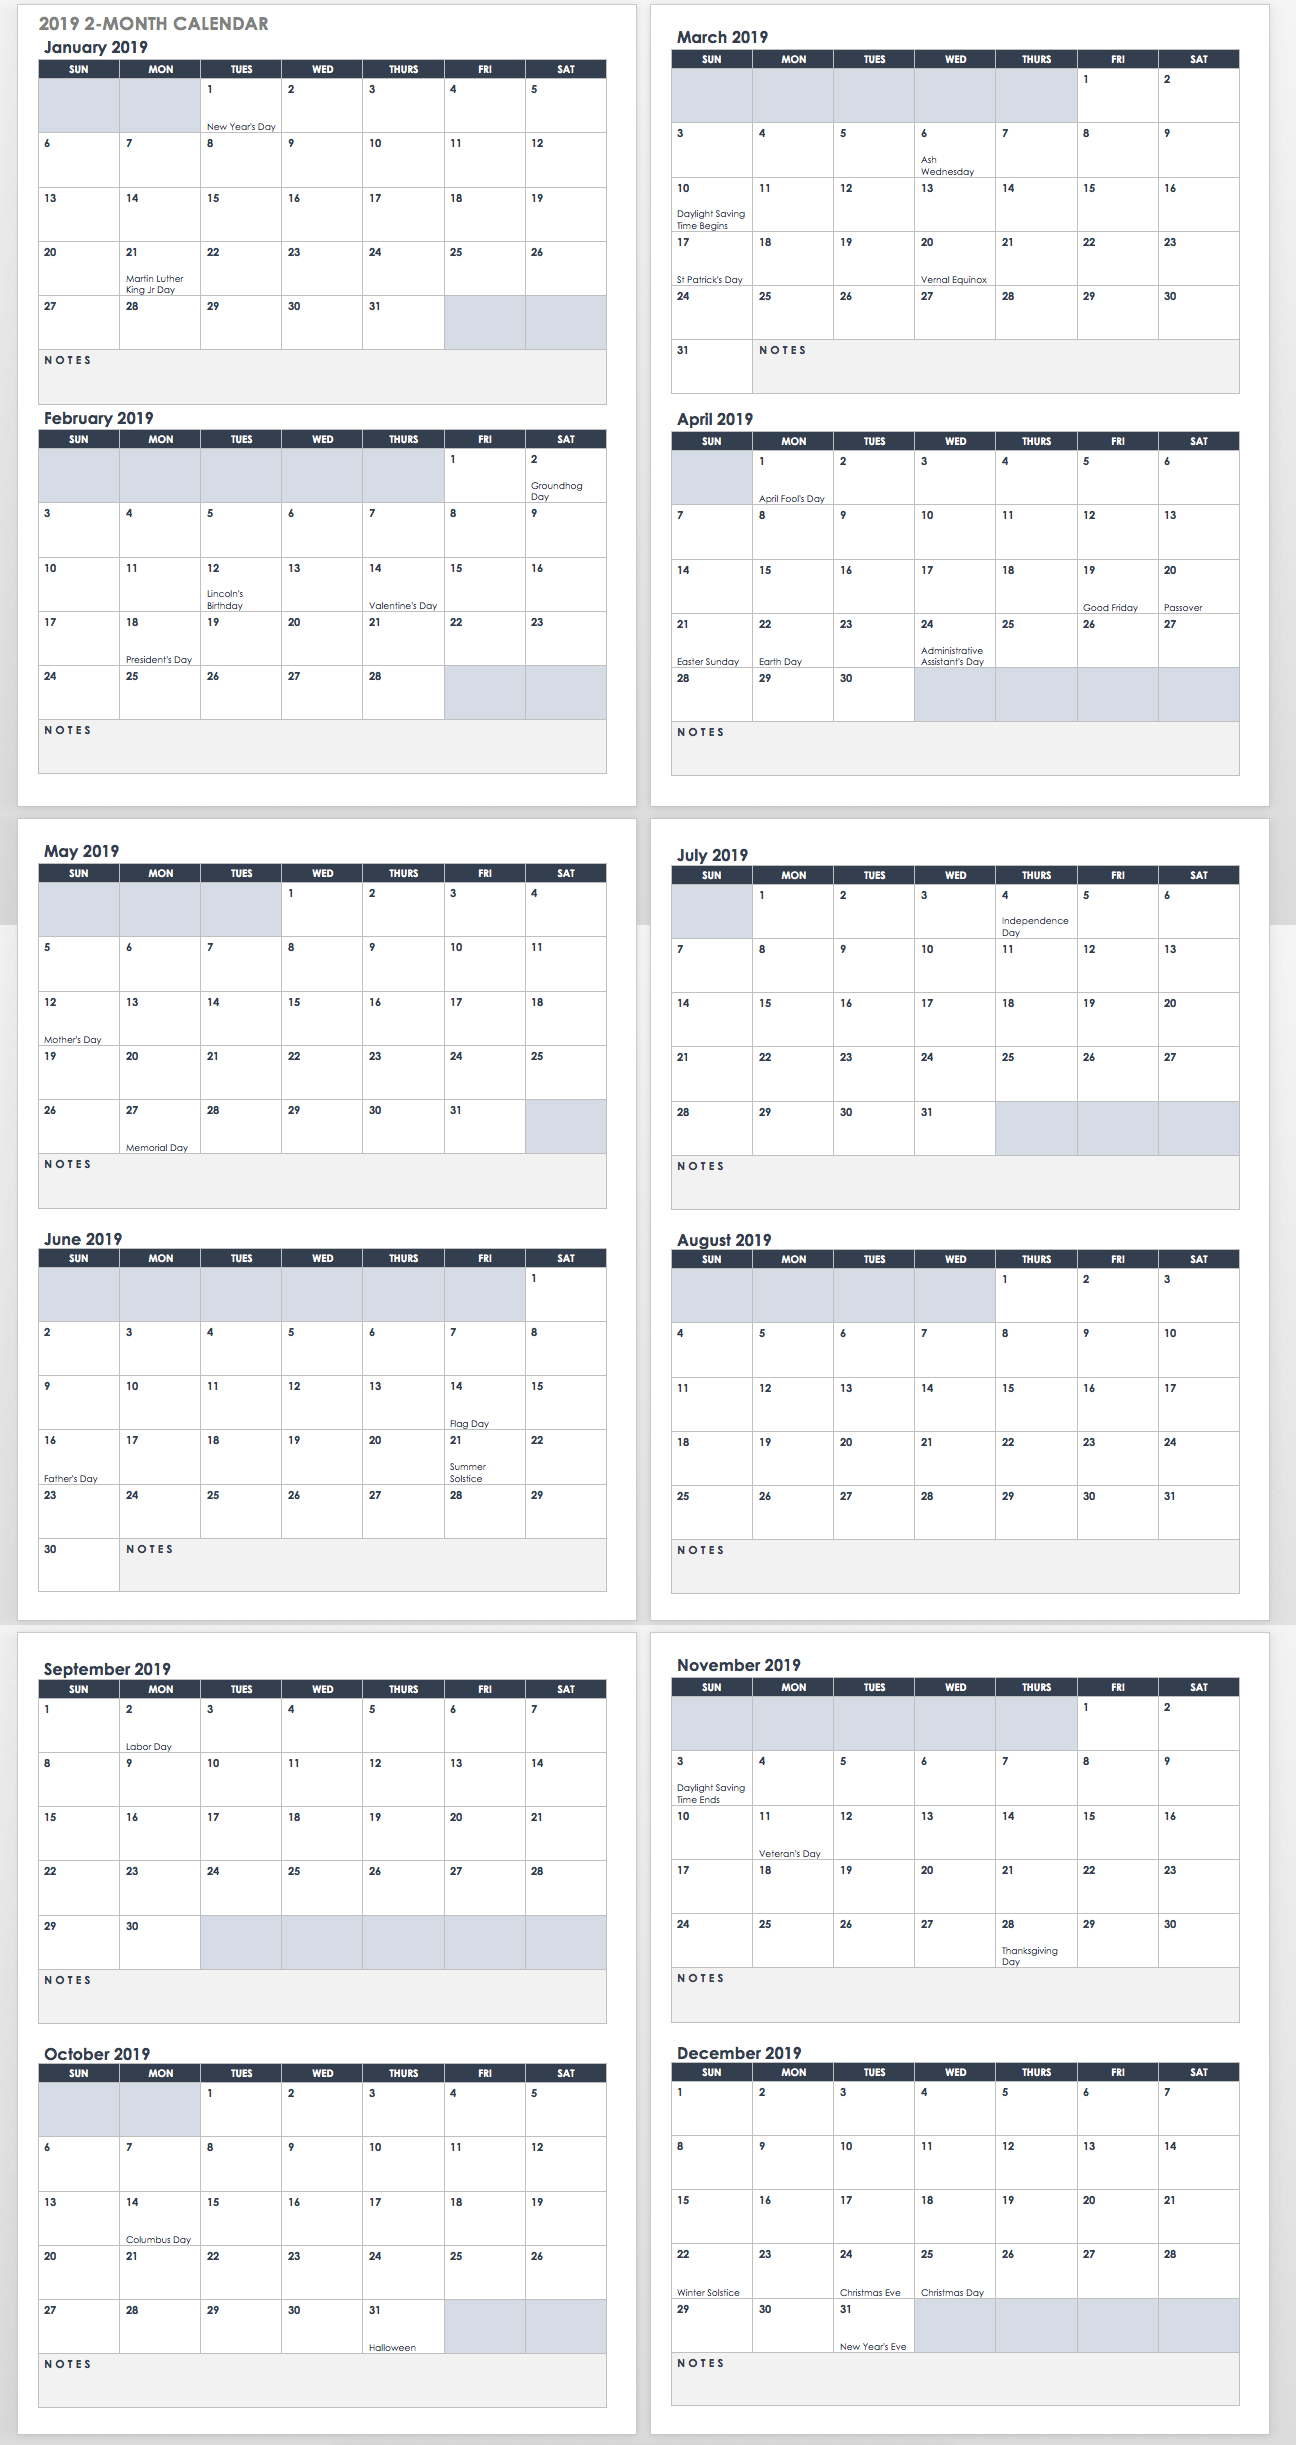 15 Free Monthly Calendar Templates   Smartsheet regarding 12 Month Calendar Template Printable